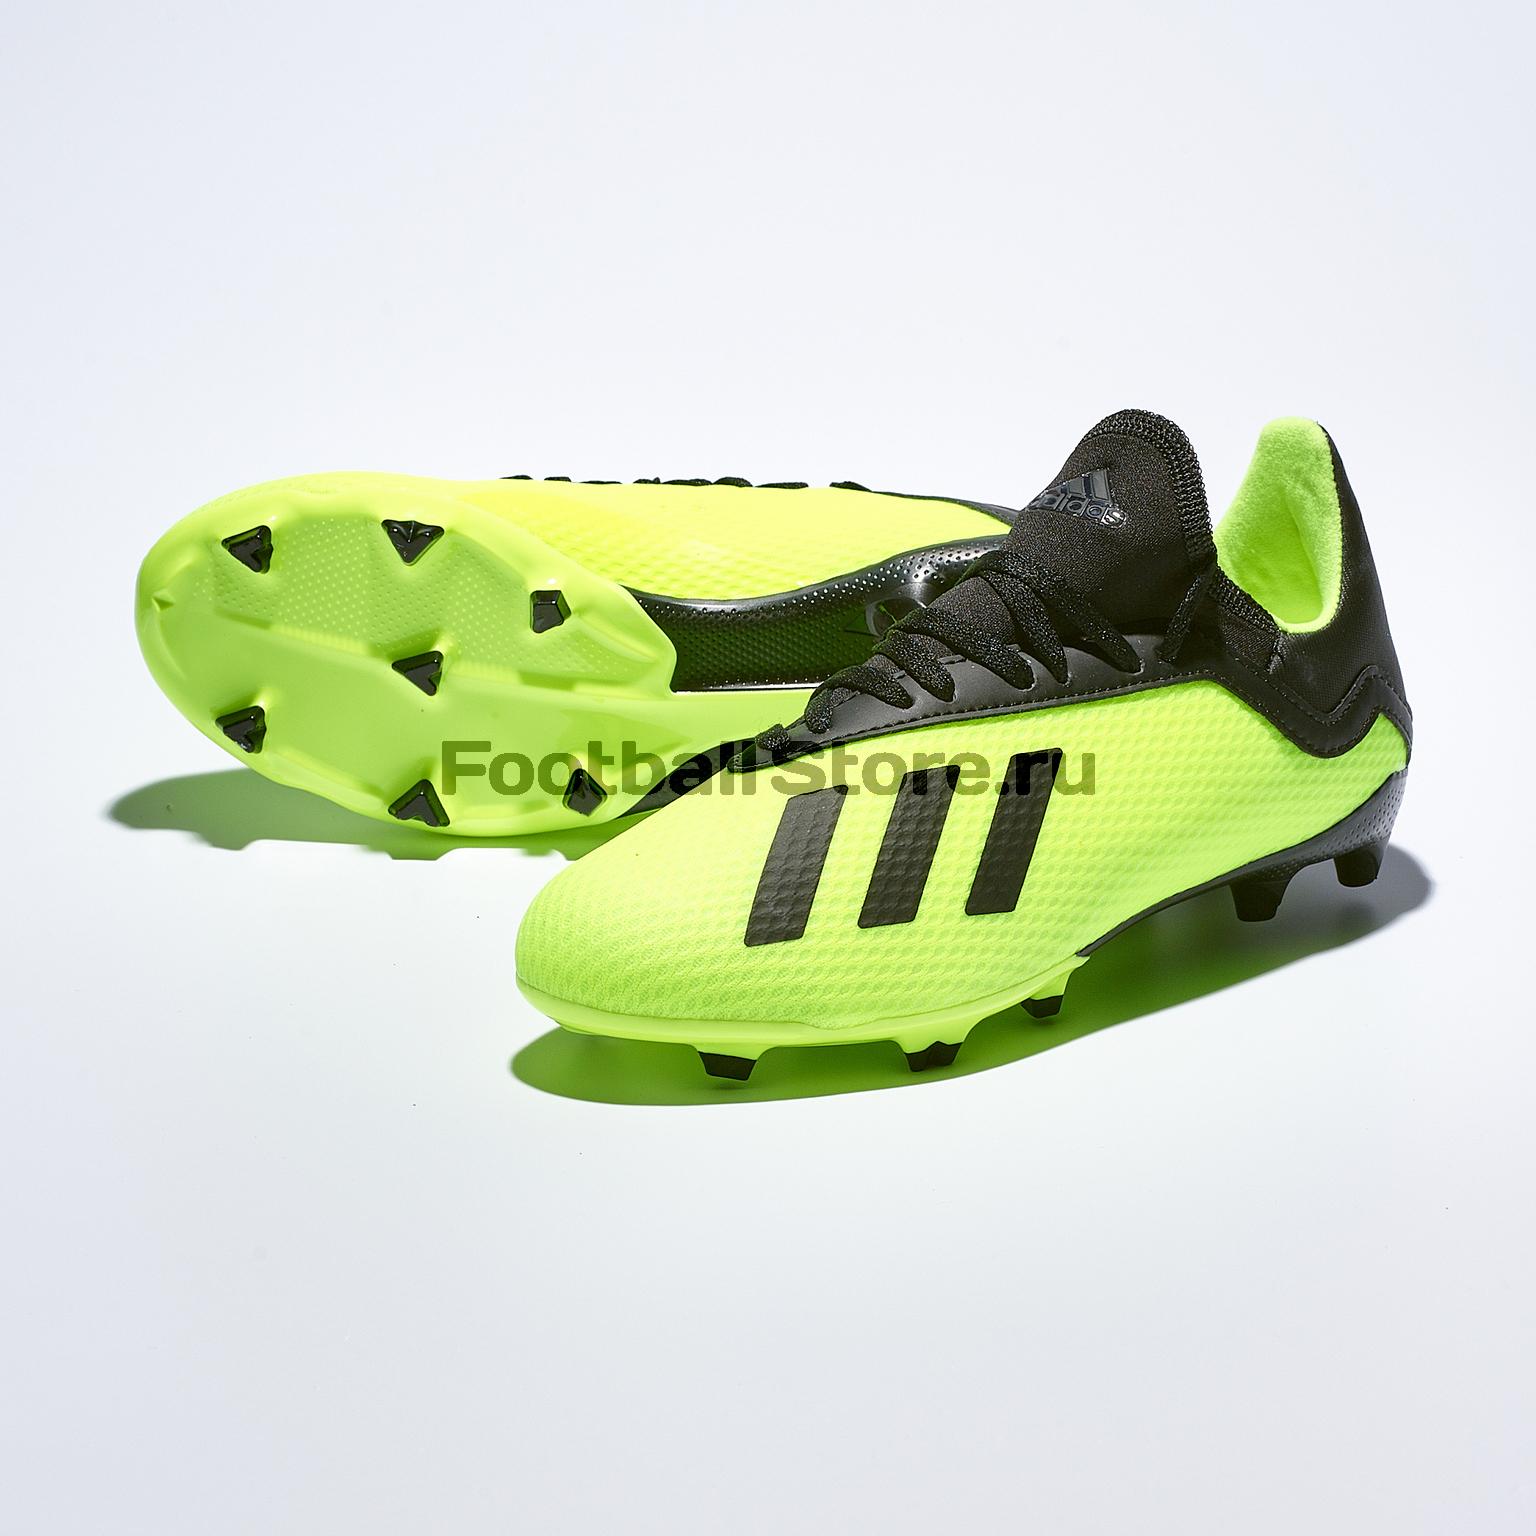 Бутсы детские Adidas X 18.3 FG DB2418 игровые бутсы adidas бутсы adidas x 16 purechaos fg bb5615